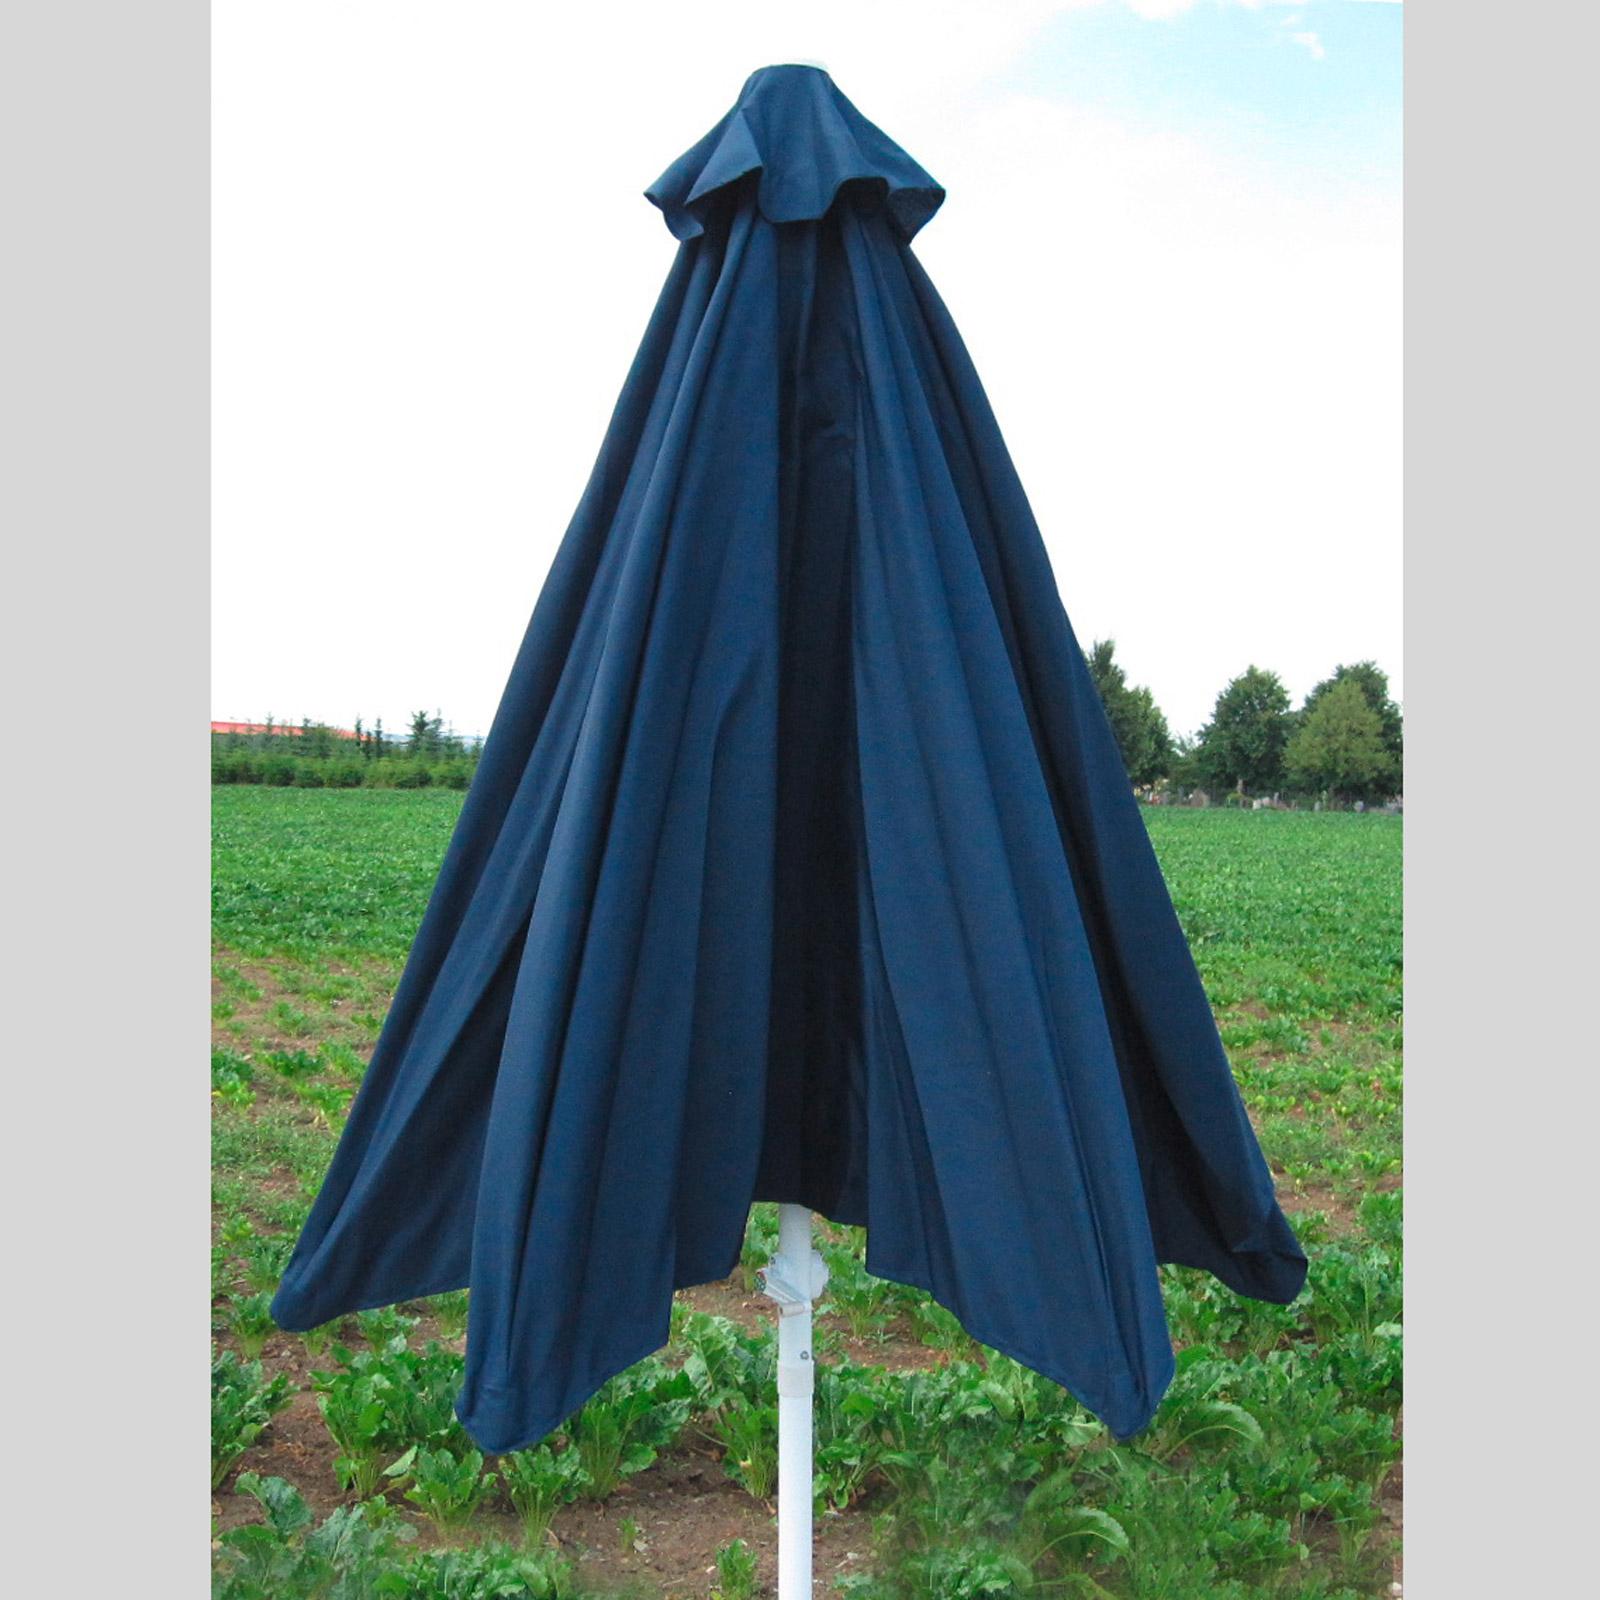 sonnenschirm sonnenschutz gartenschirm kurbelschirm kurbel schirm 3m blau 41016 ebay. Black Bedroom Furniture Sets. Home Design Ideas